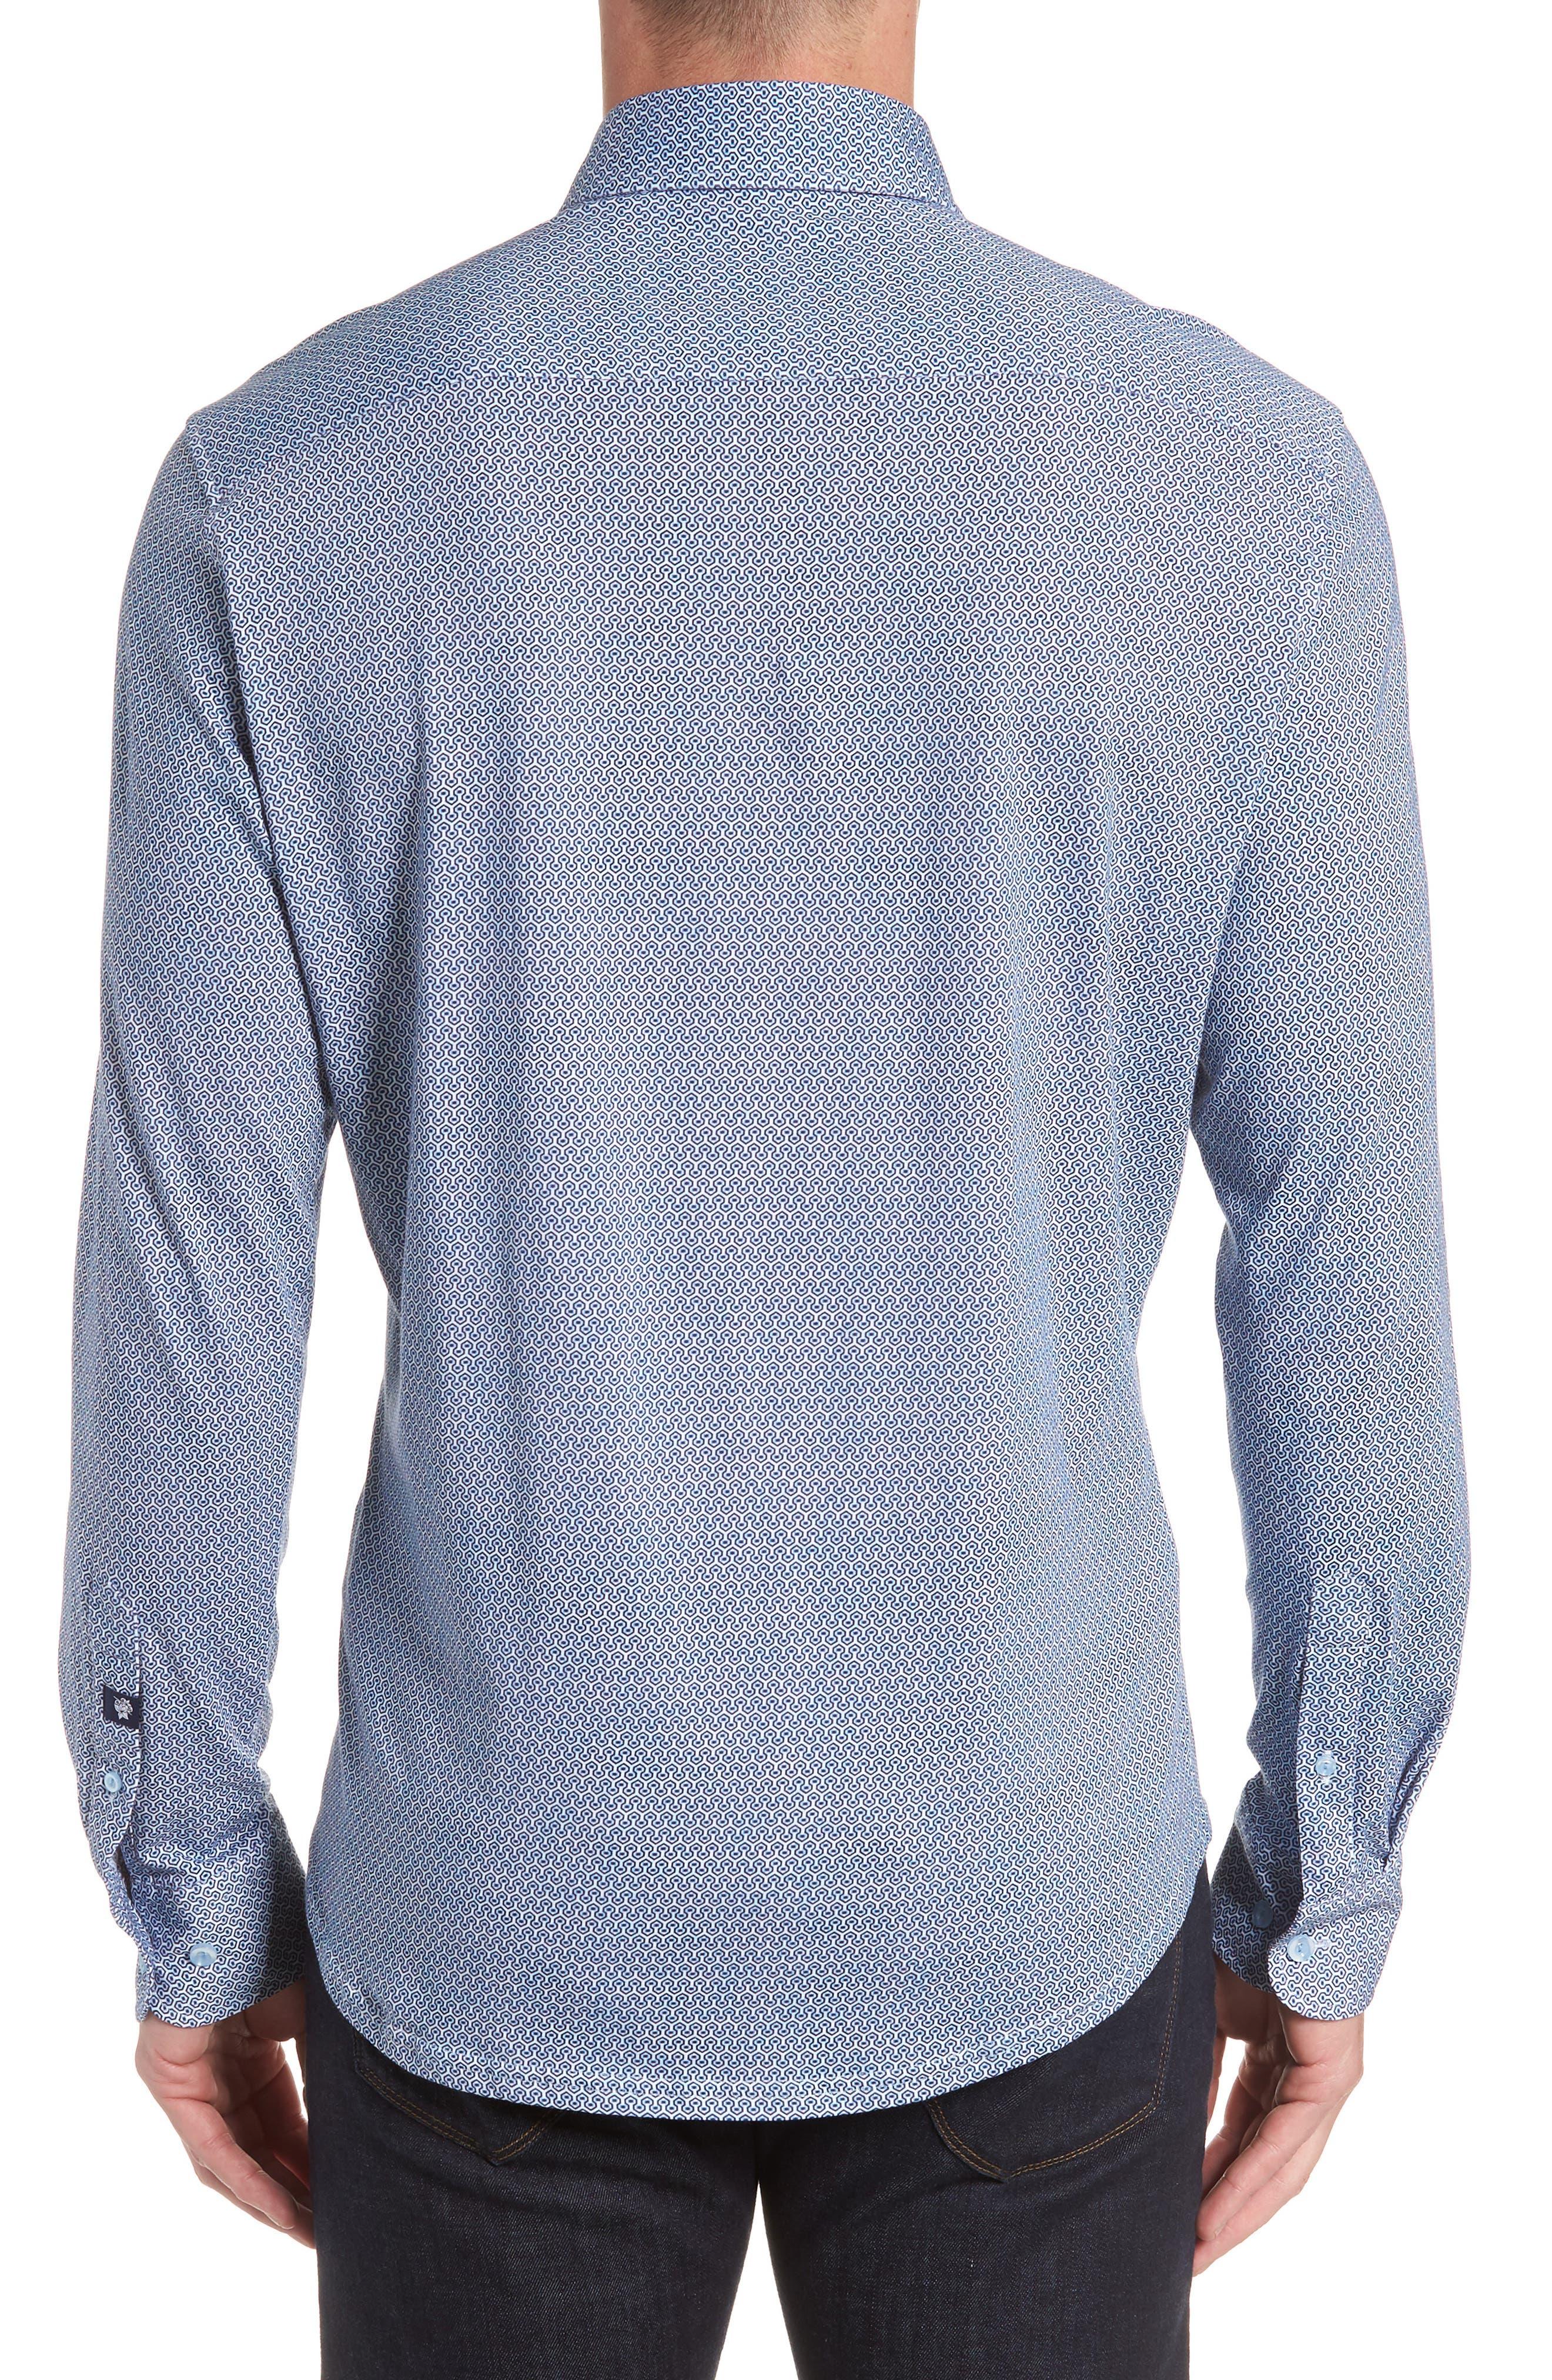 Honeycomb Print Knit Sport Shirt,                             Alternate thumbnail 3, color,                             Blue